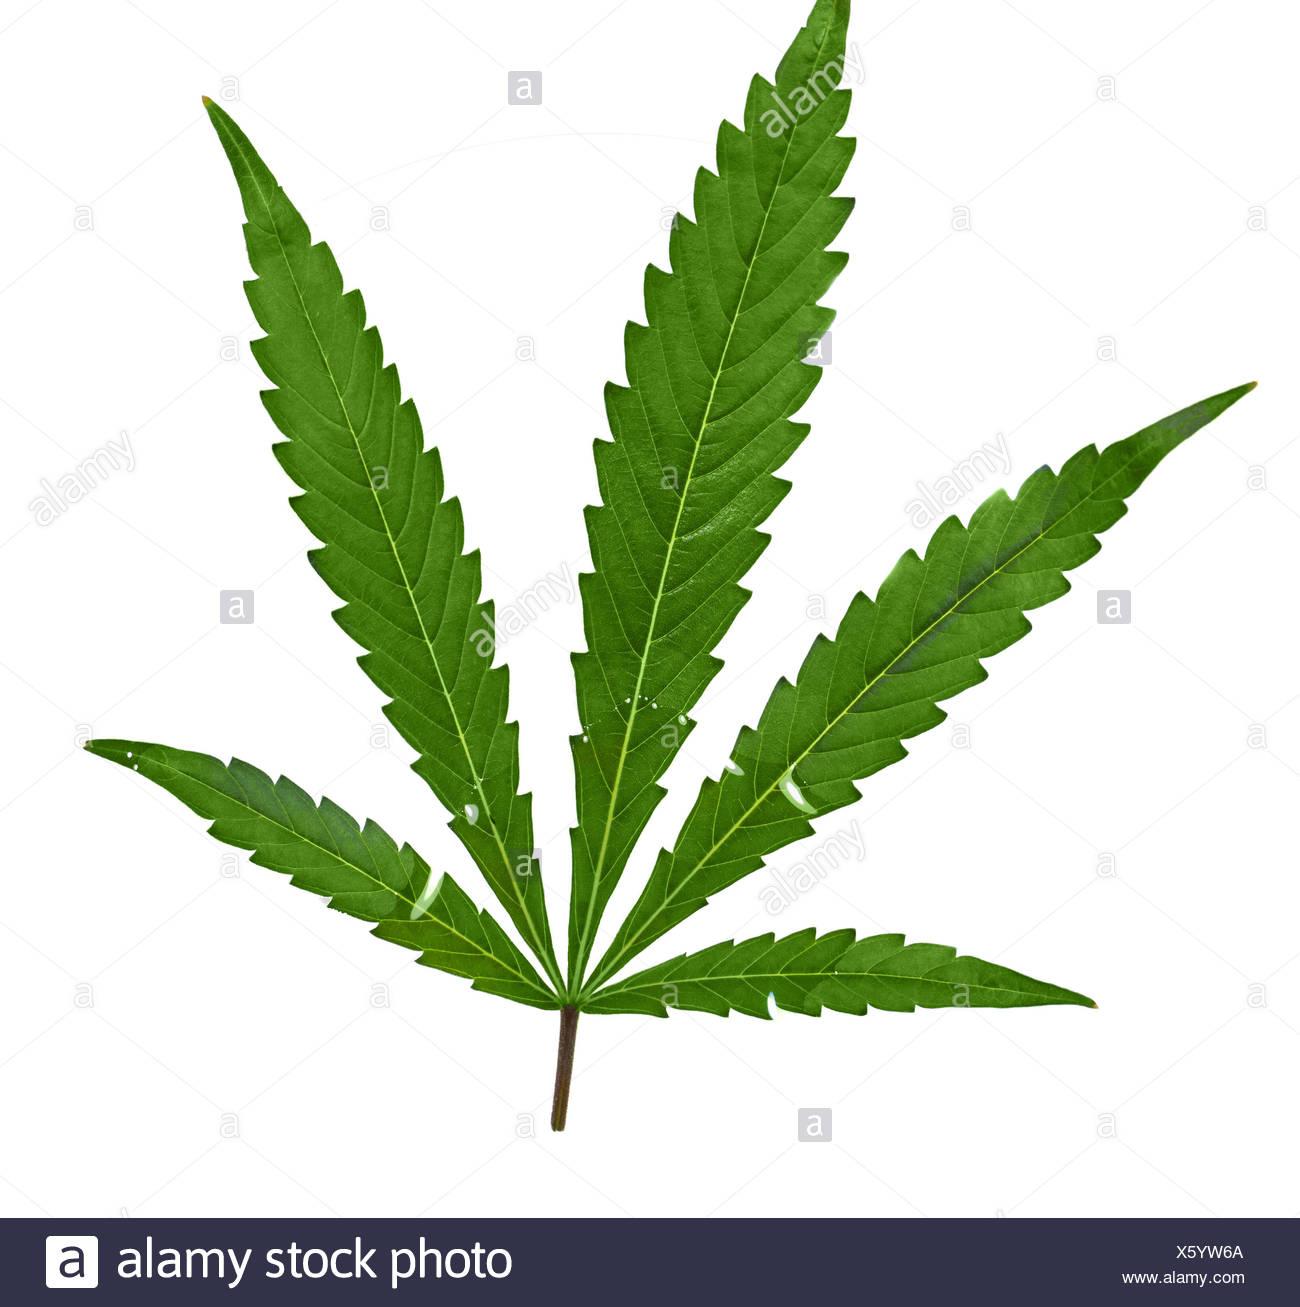 Cannabis leaf optional - Stock Image